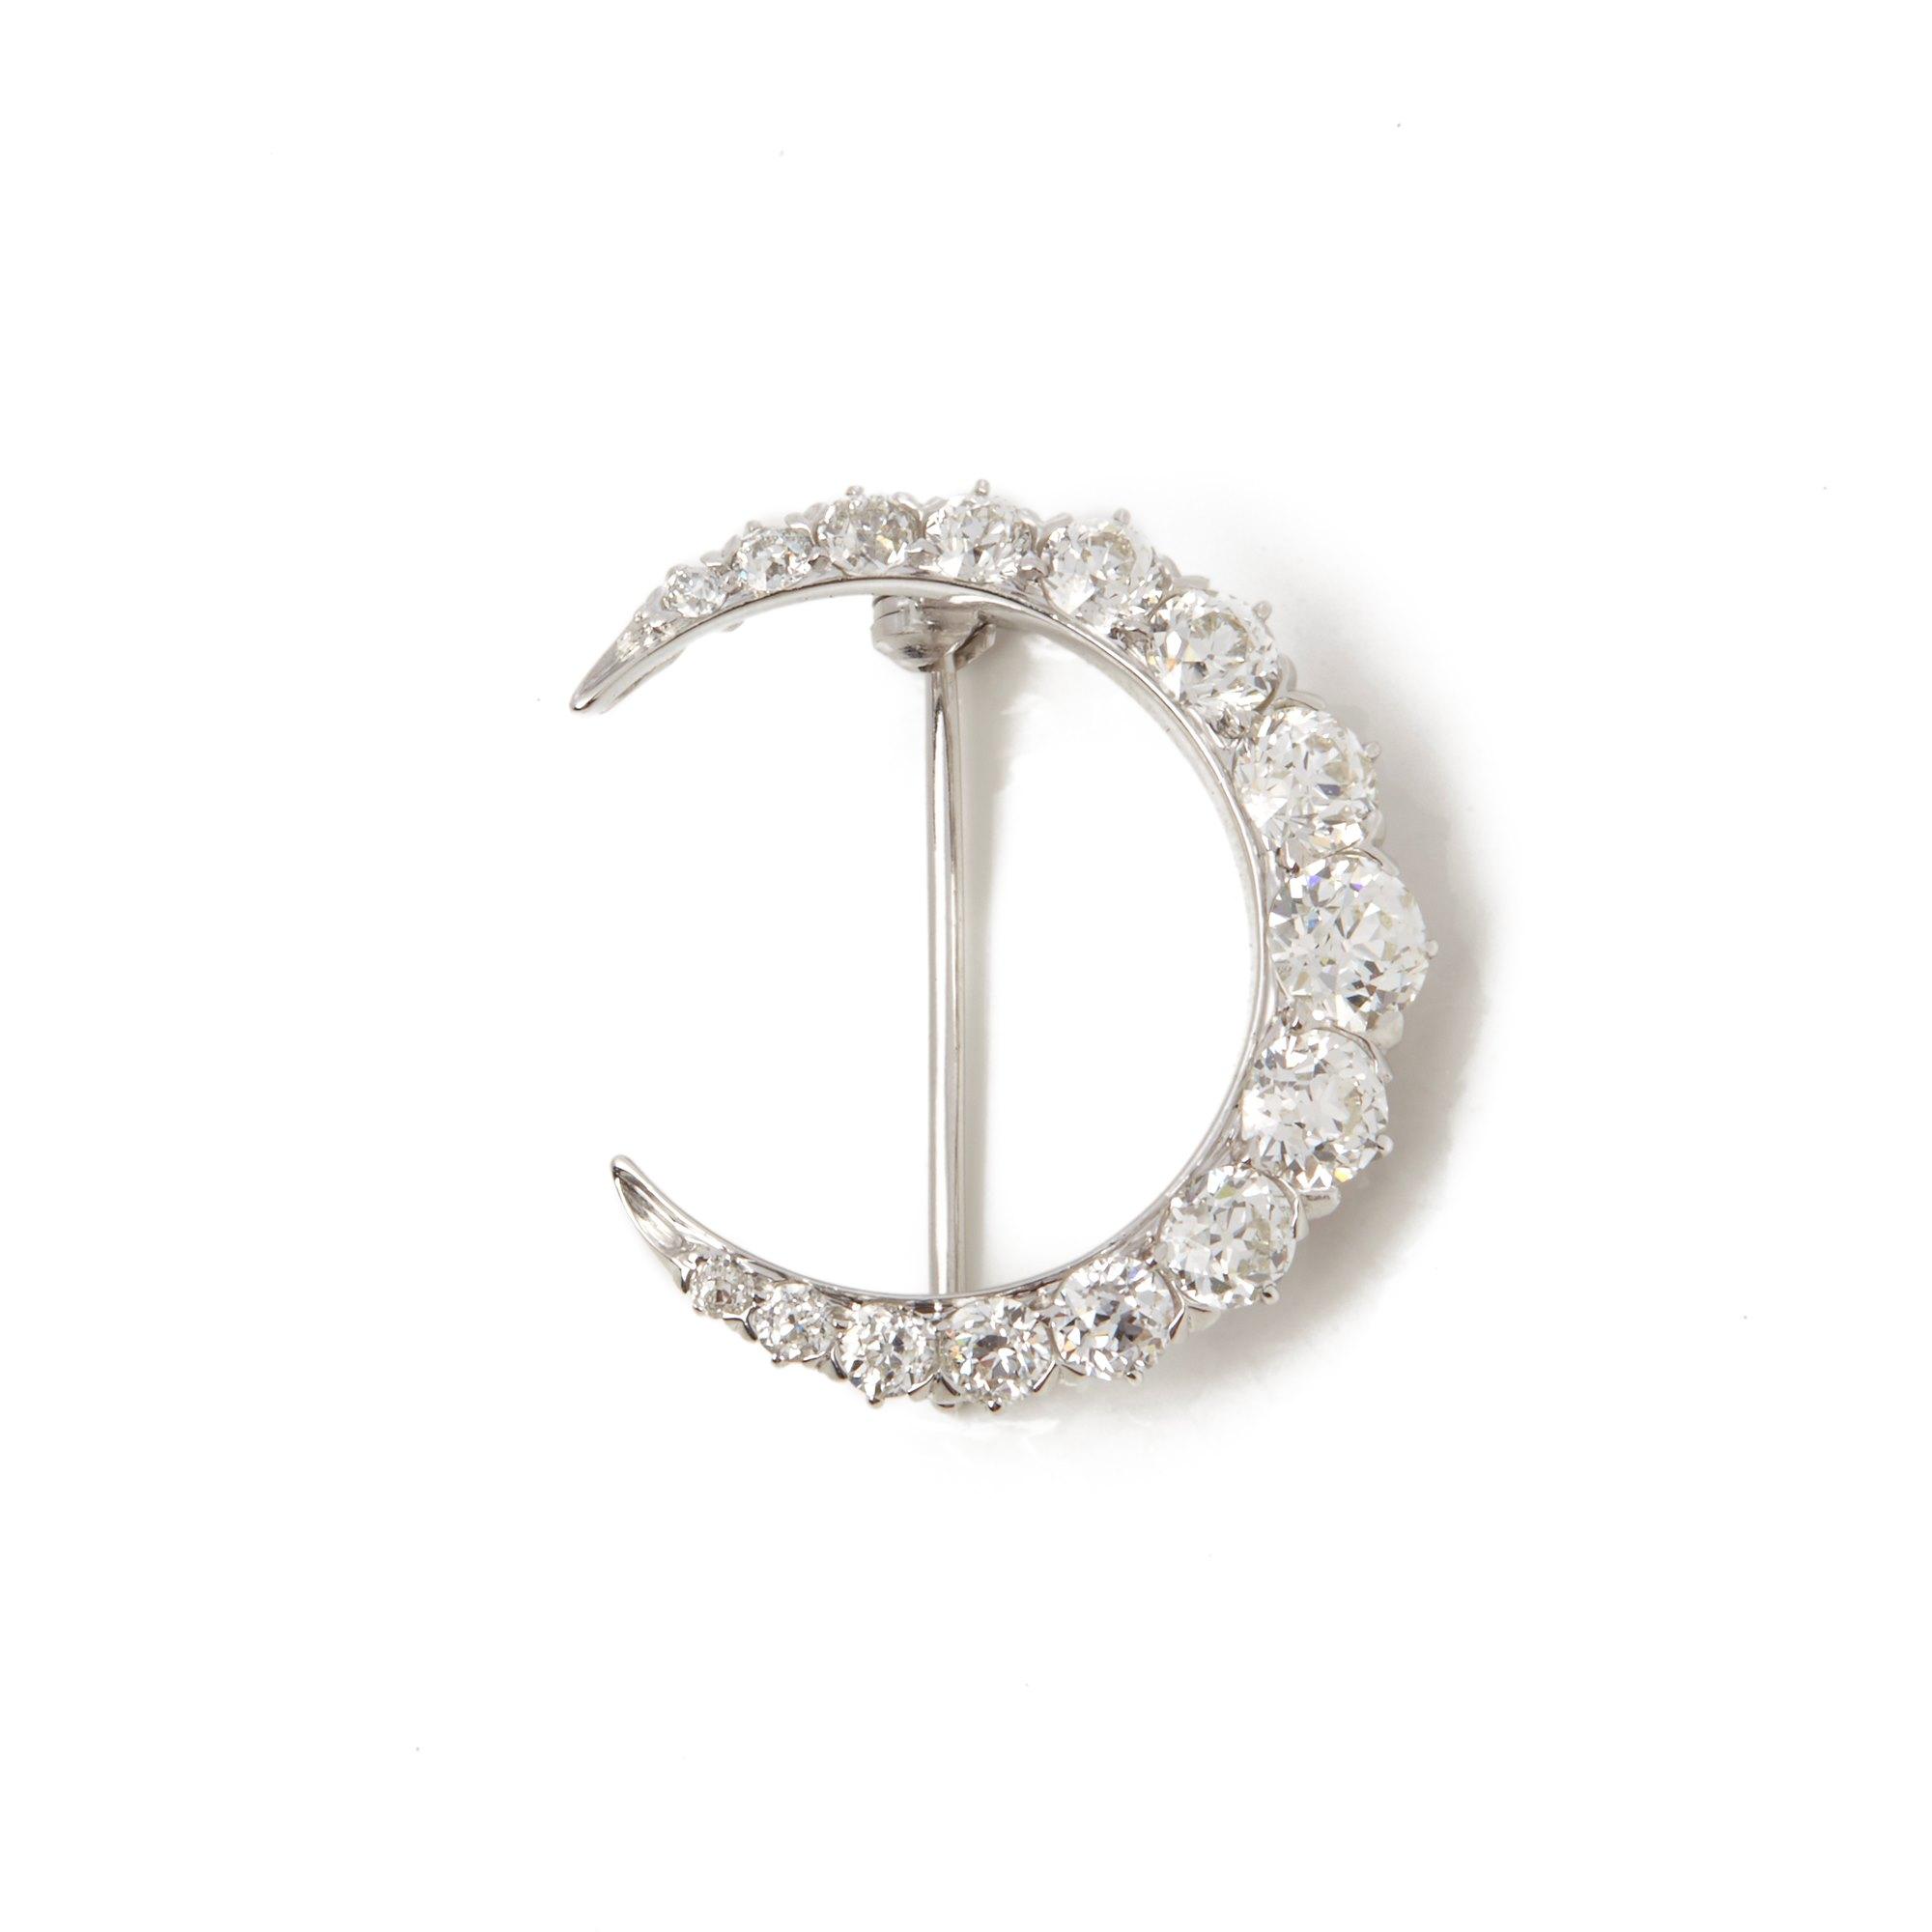 Tiffany & Co. Platinum Diamond Crescent Moon Brooch